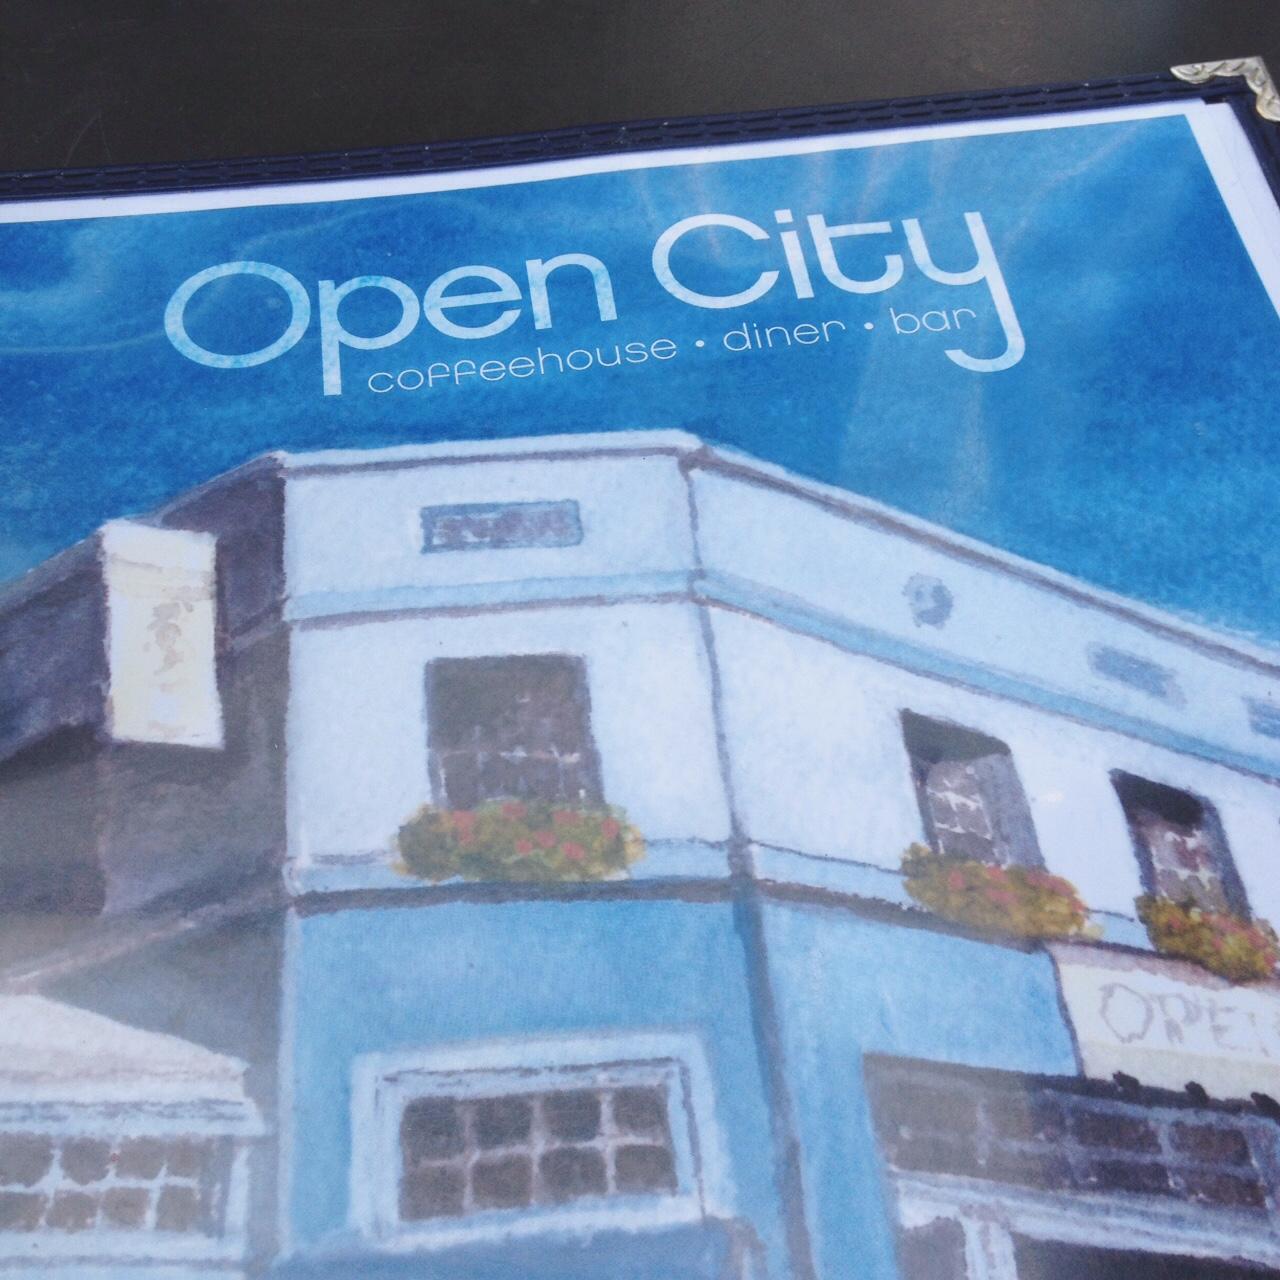 Open City, Washington DC